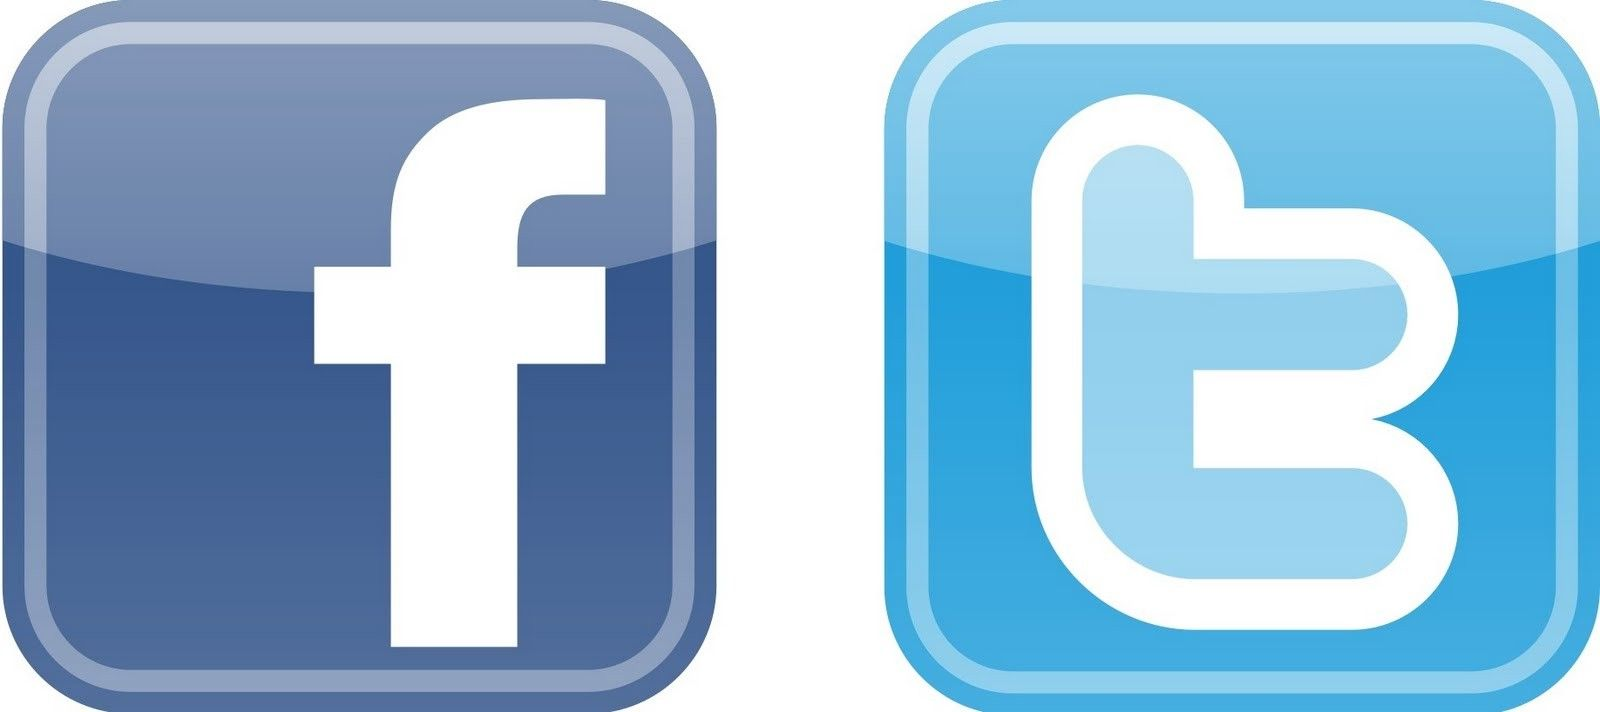 Facebook Vector Logo Hd Free Large Images Facebook Icons Twitter Logo Web Marketing